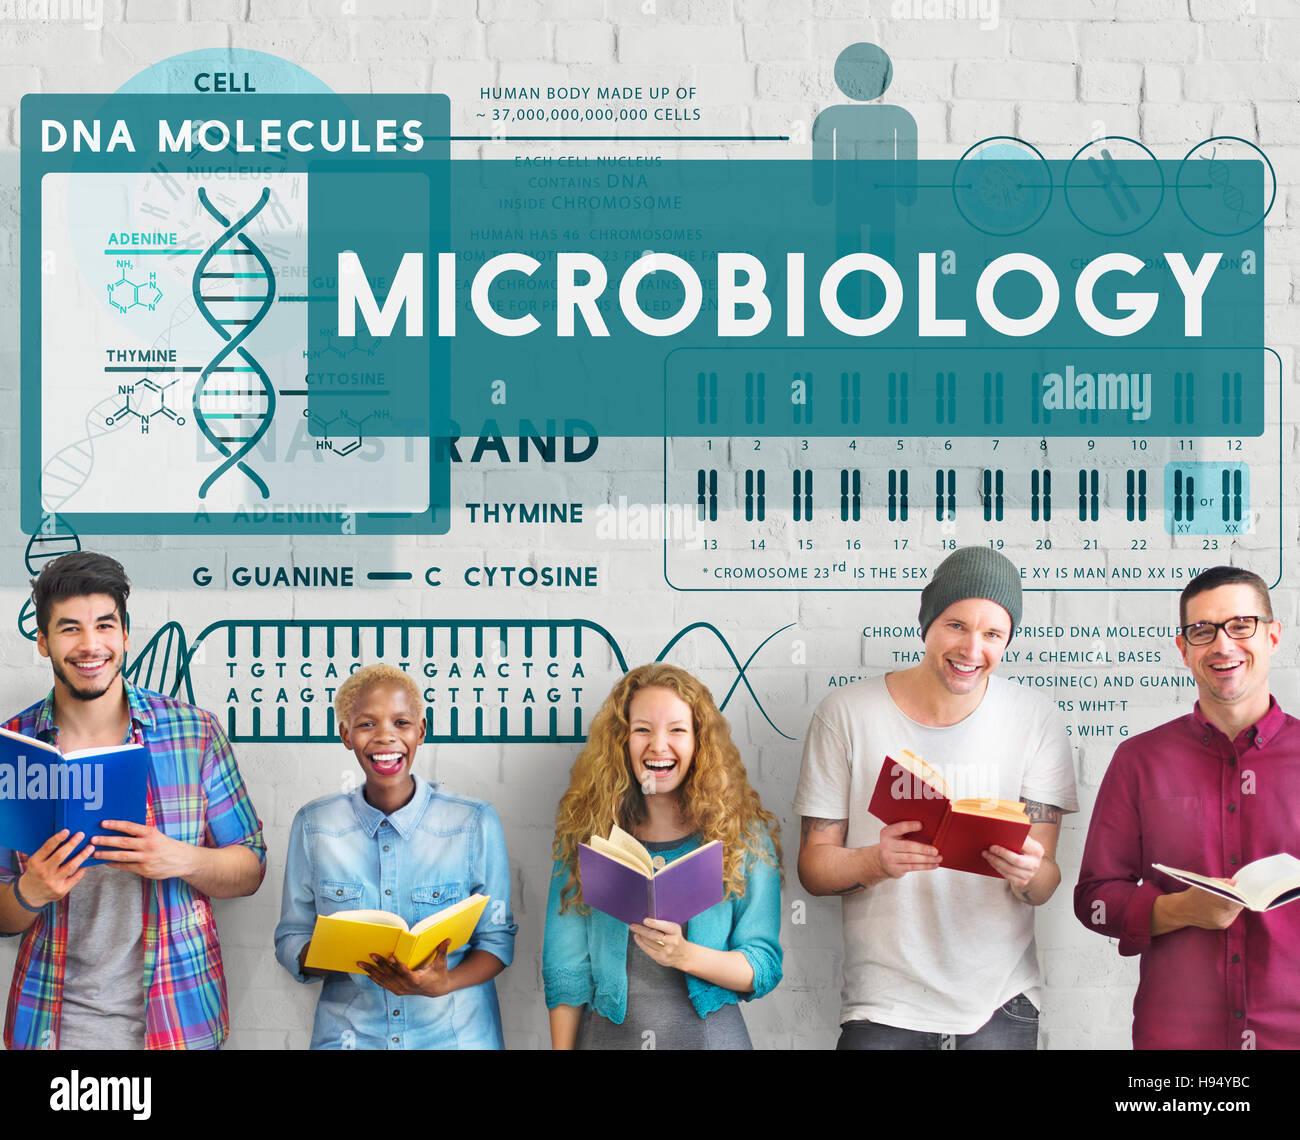 MicroBiology Bacteria Disease Illness Laboratory Concept - Stock Image